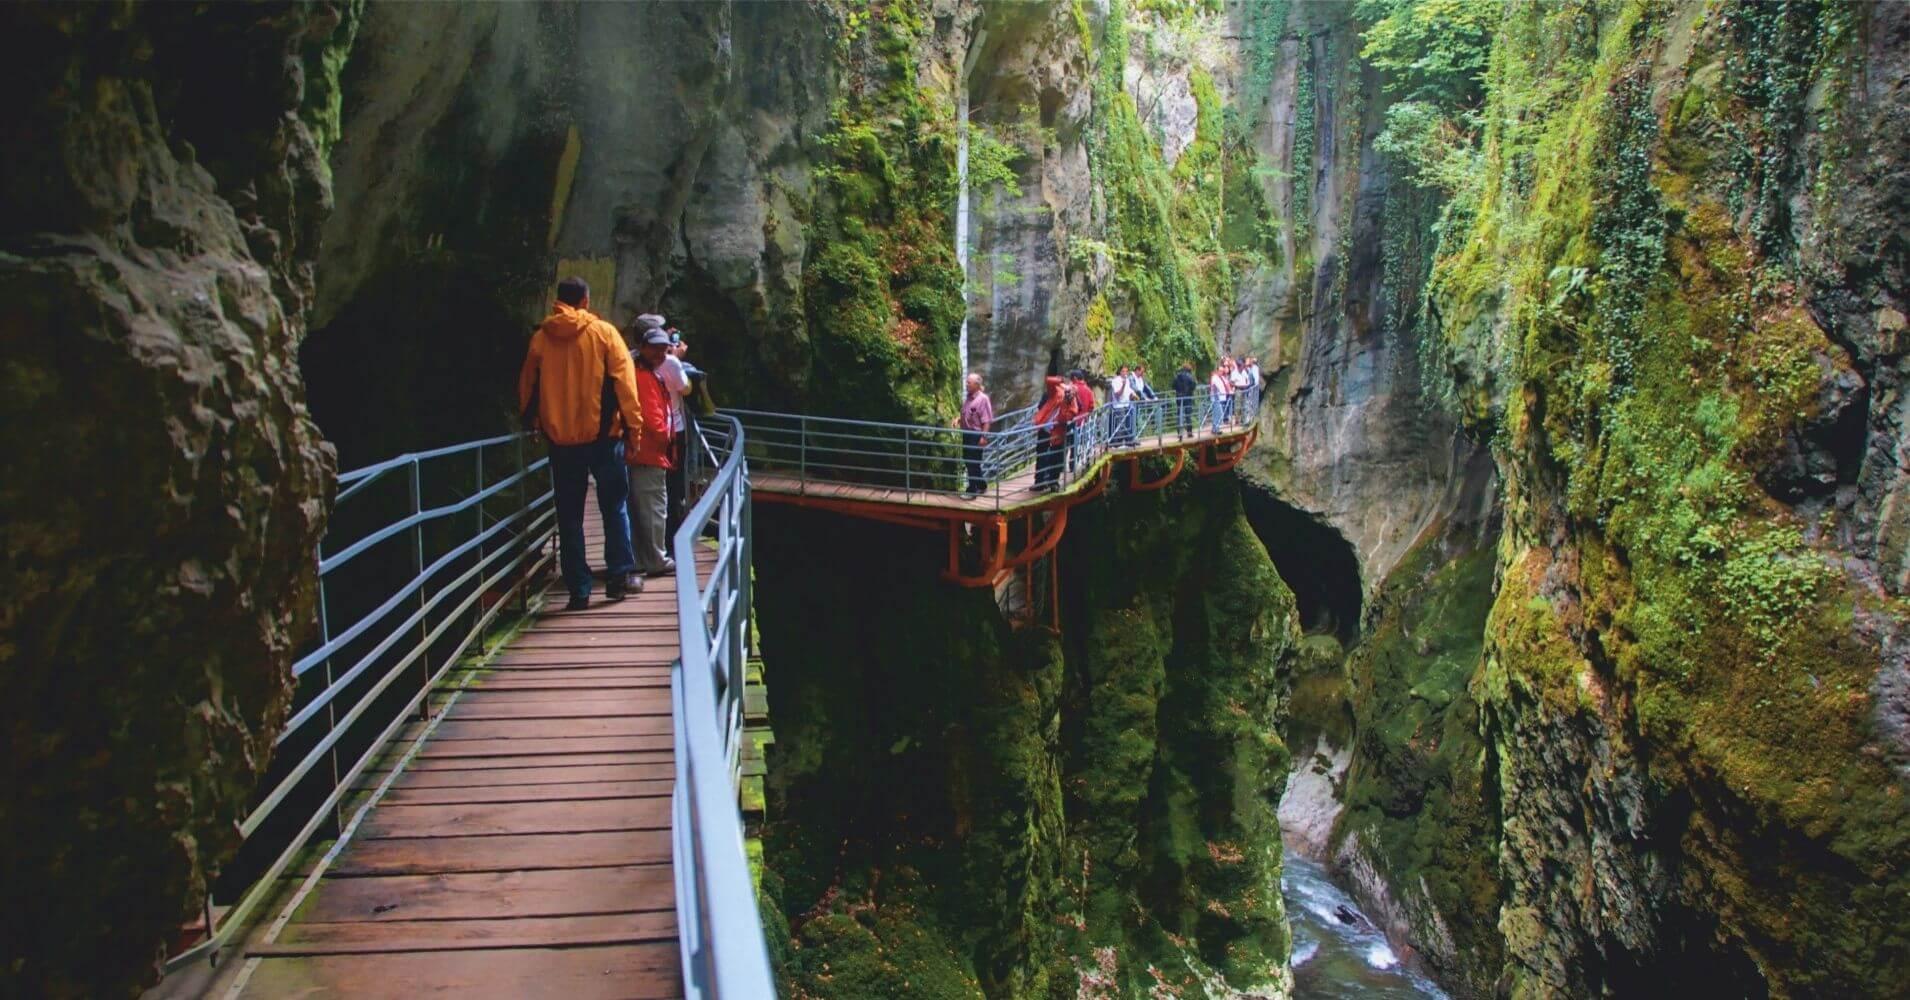 Gorges du Fier, Lovagni en Alta Saboya, Auvernia-Ródano-Alpes. Francia.